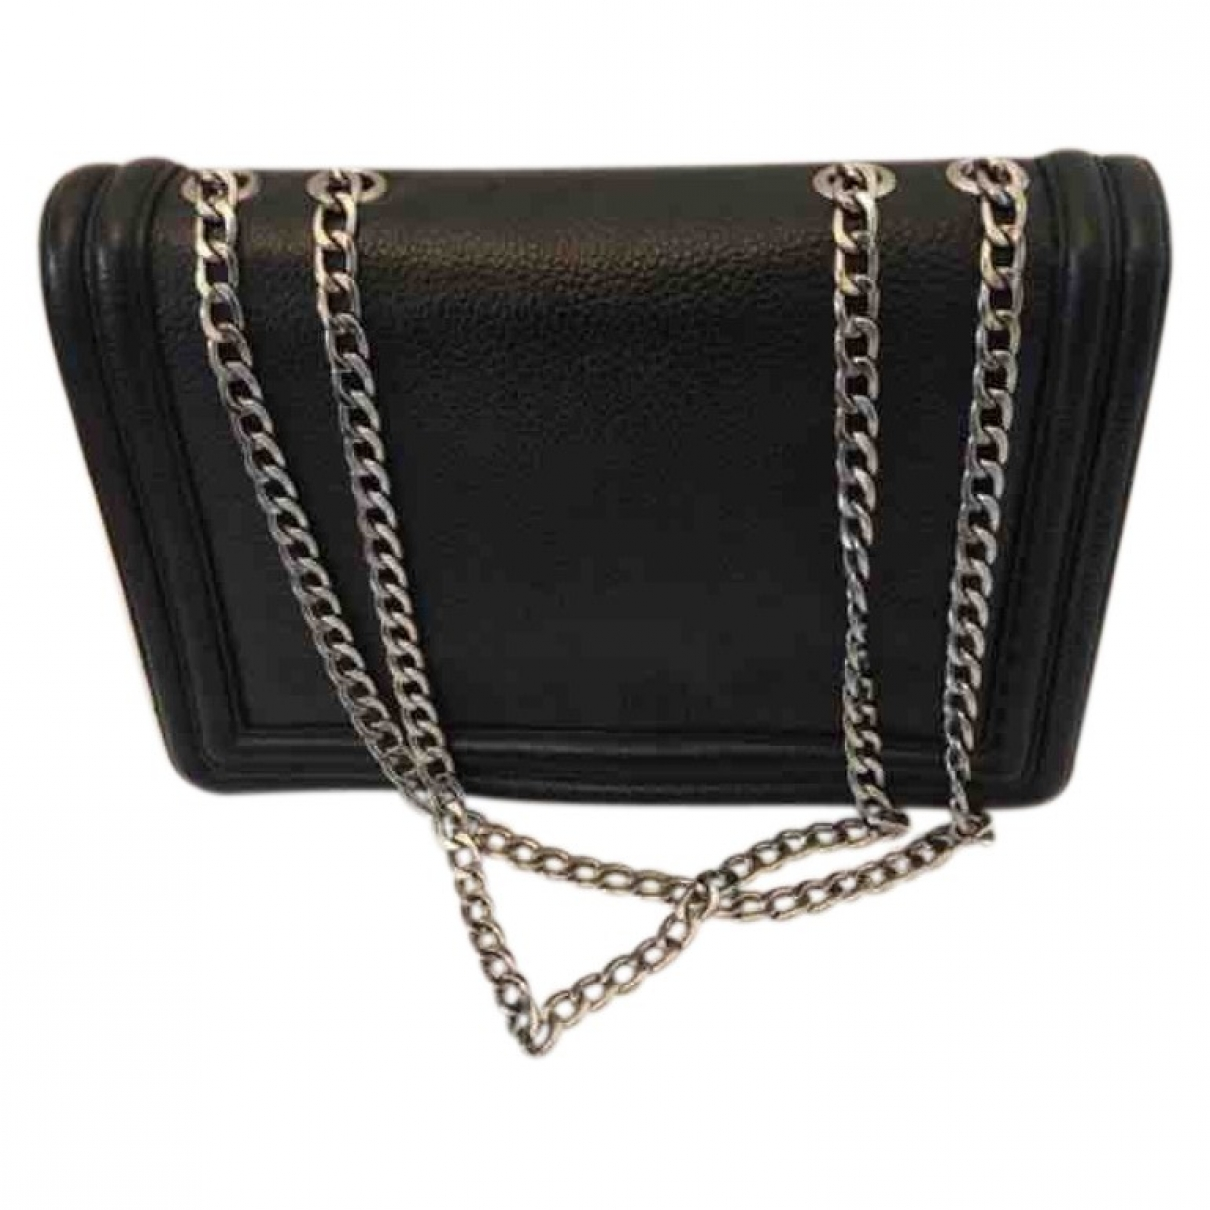 Lina Brax \N Black Leather handbag for Women \N